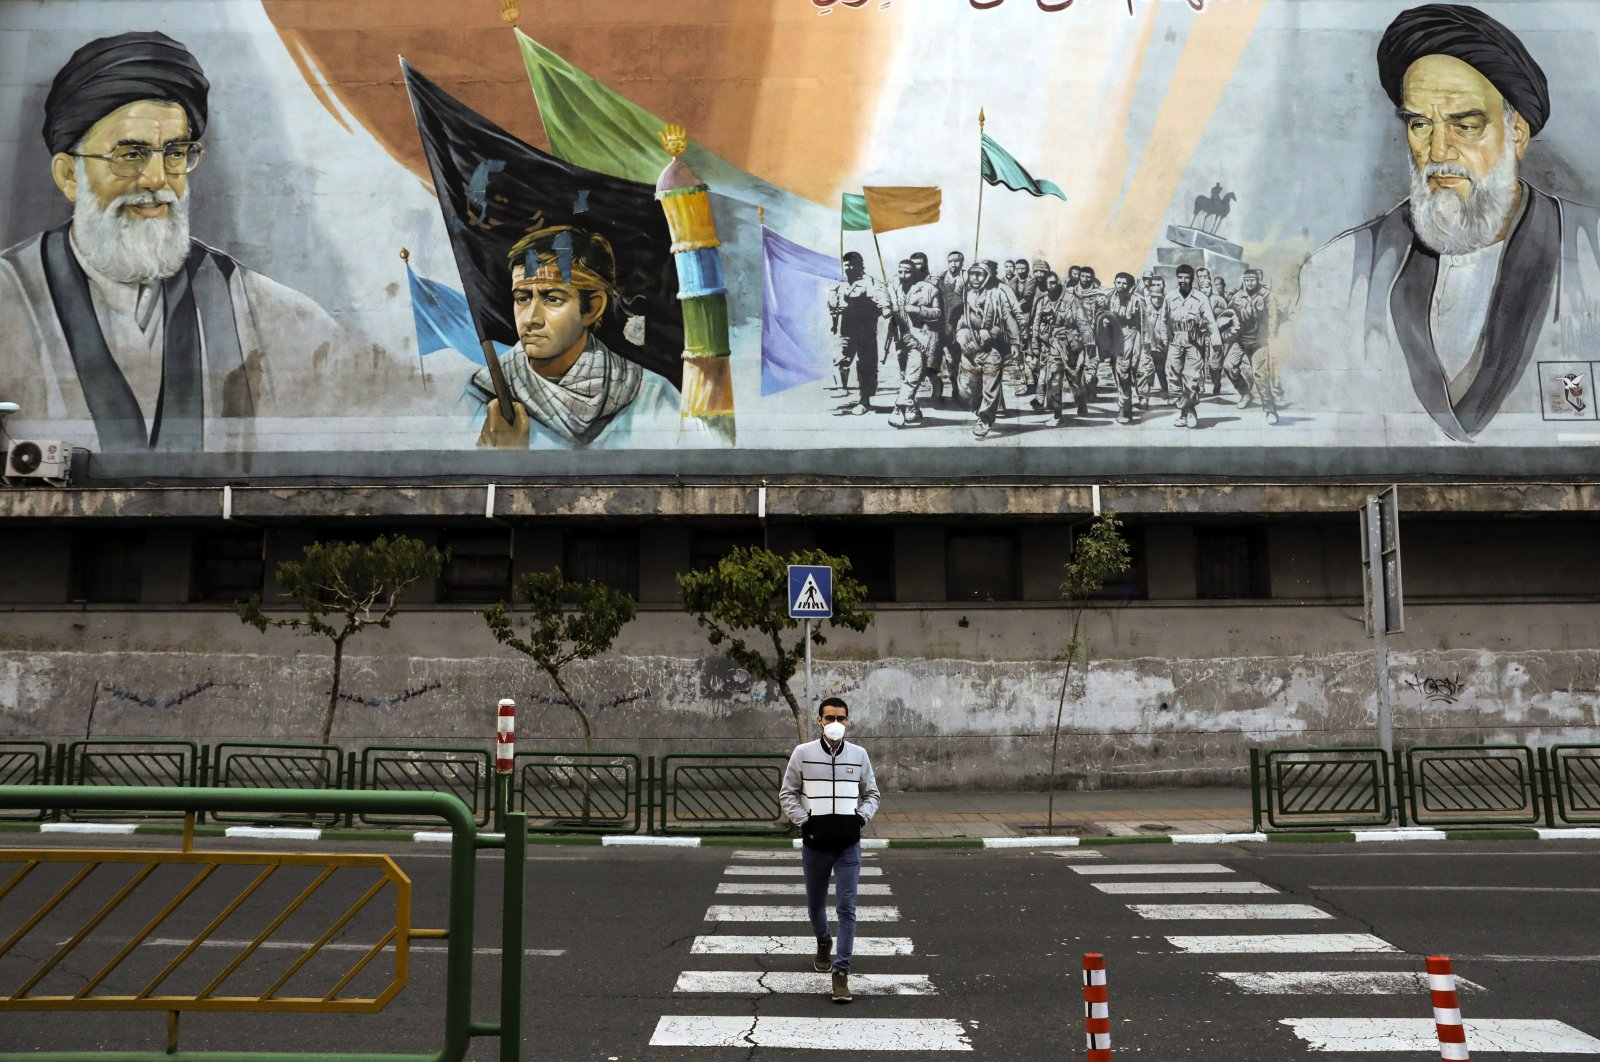 A man crosses an empty street under portraits of the late Iranian revolutionary founder Ayatollah Khomeini, right, and Supreme Leader Ayatollah Ali Khamenei, left, in Tehran, Iran, April 3, 2020 photo, . (AP Photo)